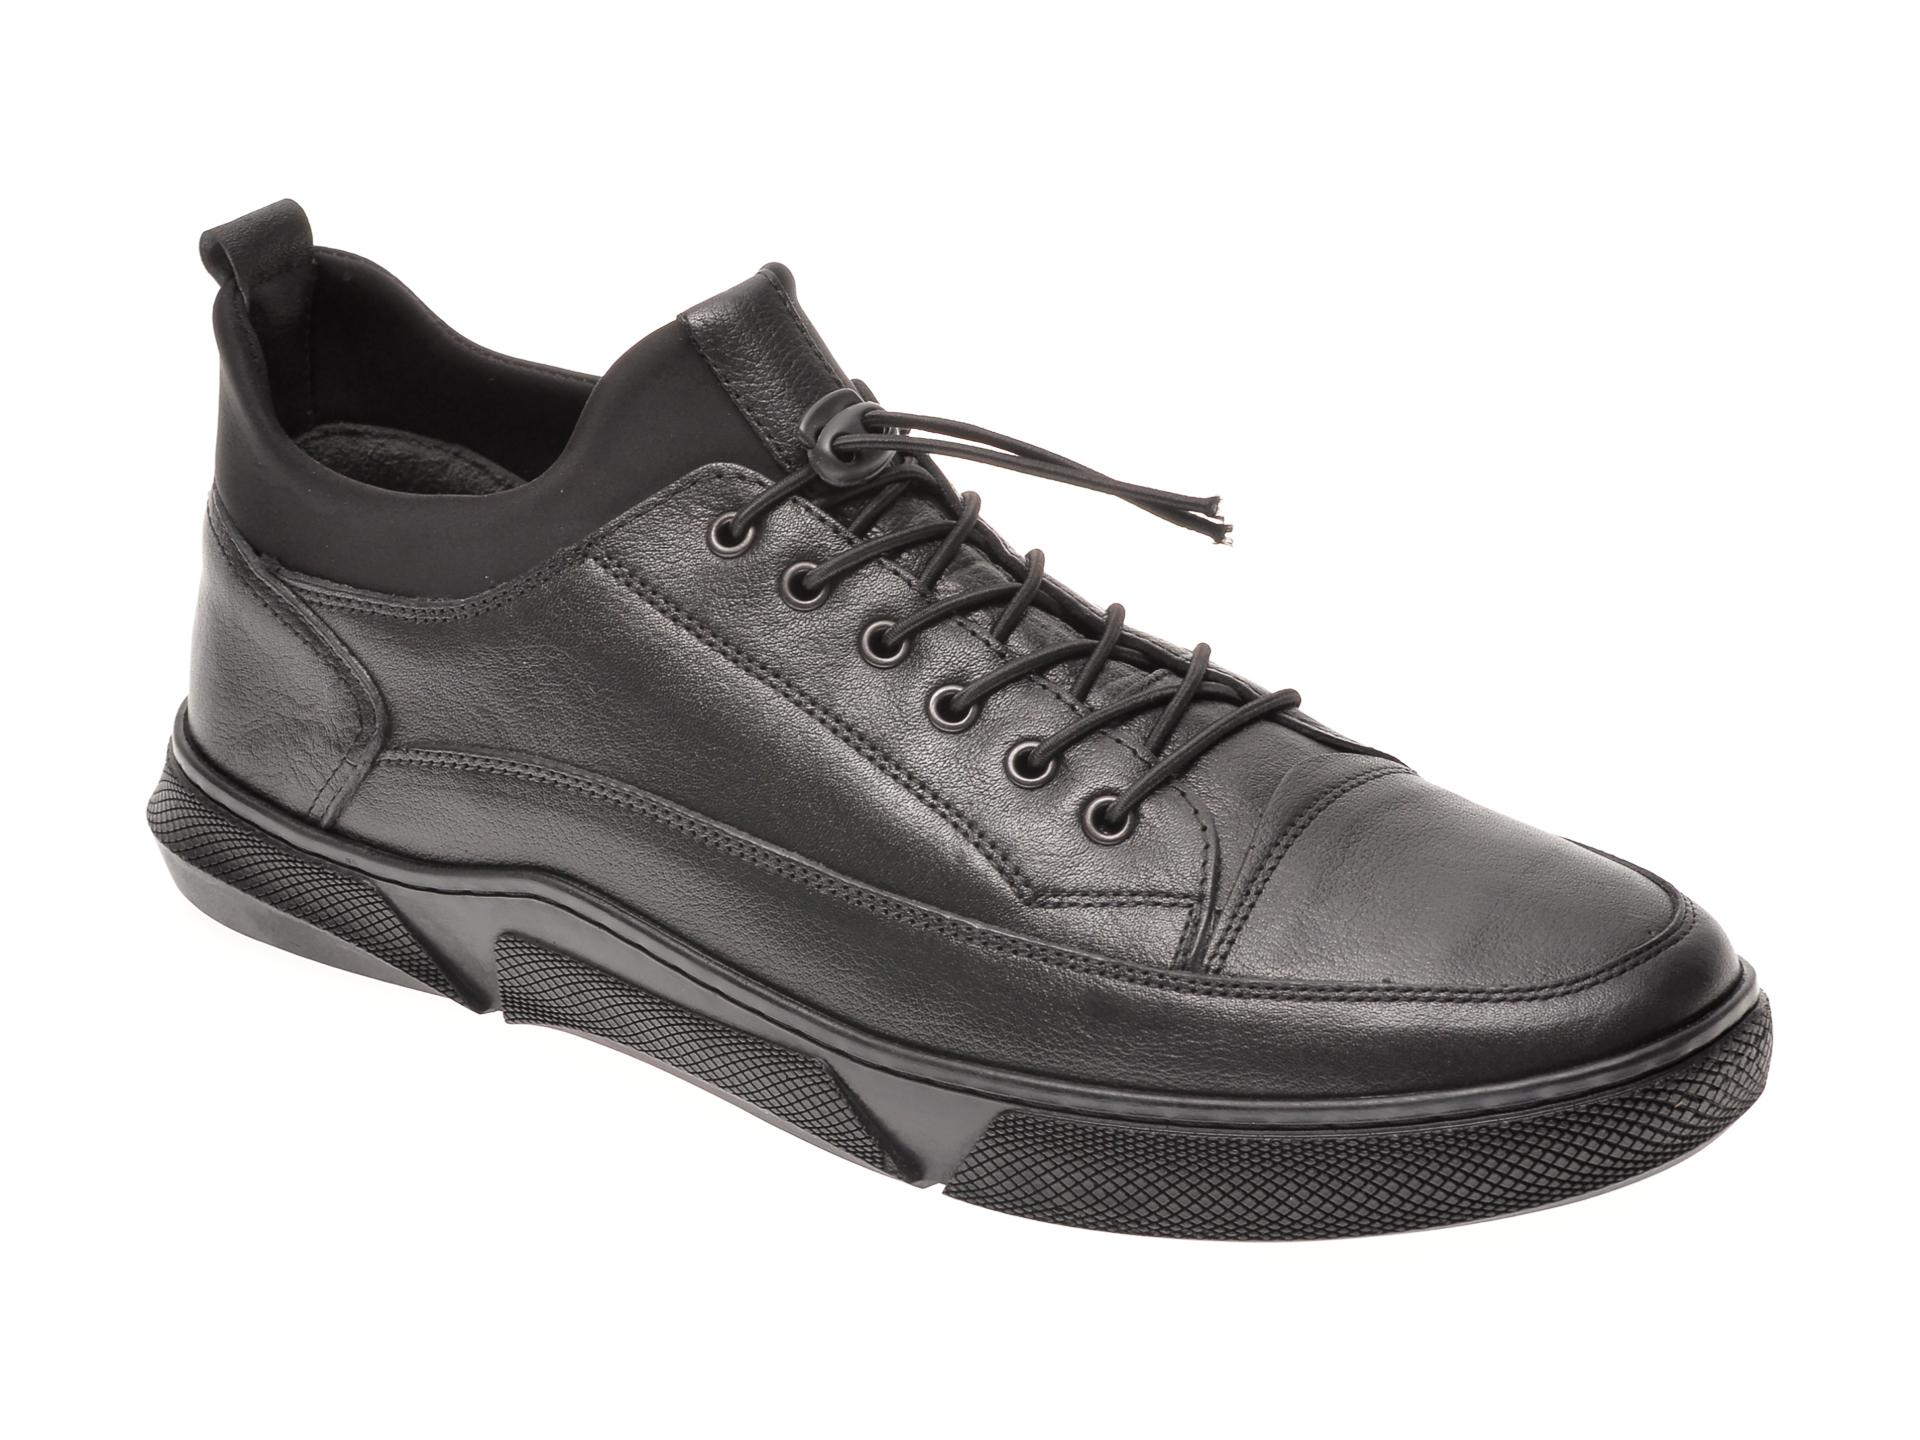 Pantofi OTTER negri, 6002, din piele naturala imagine